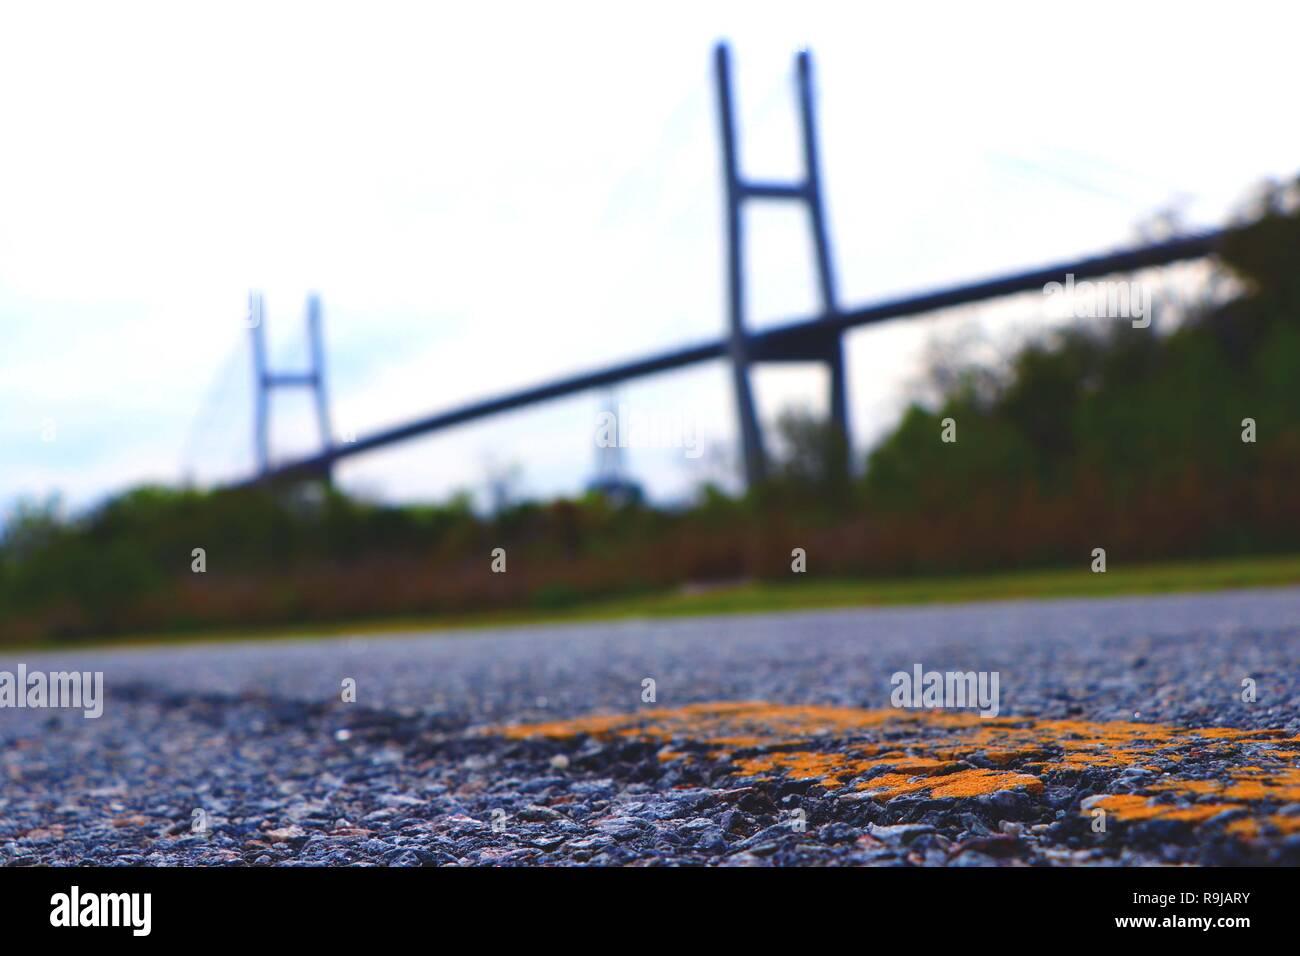 Take the road less traveled - Stock Image